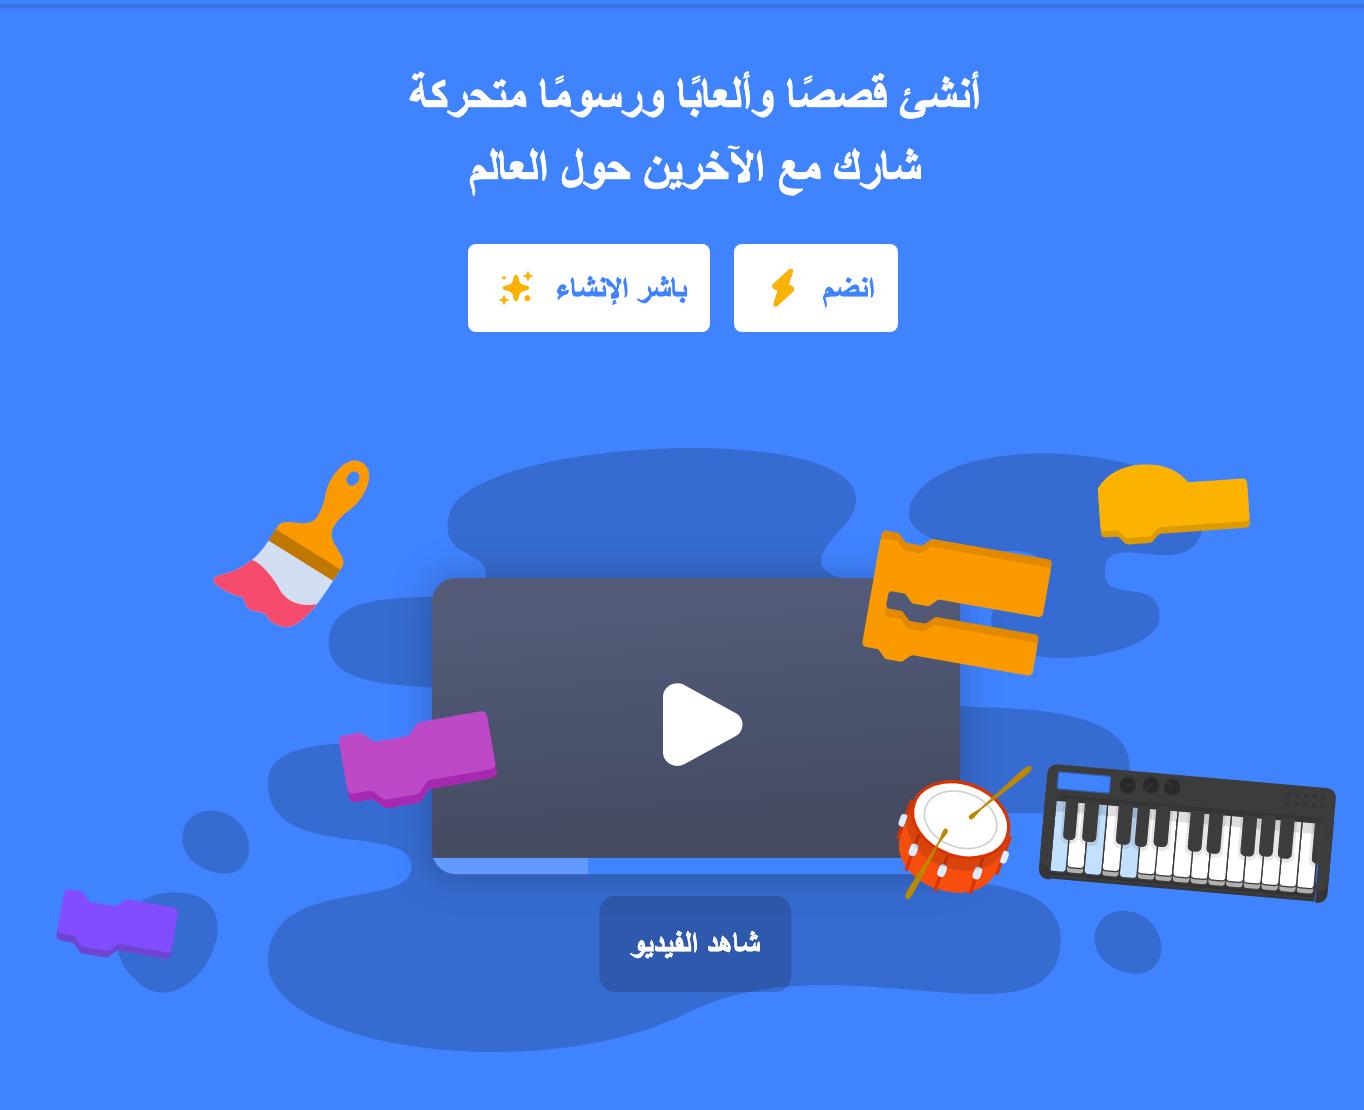 سكراتش بالعربي